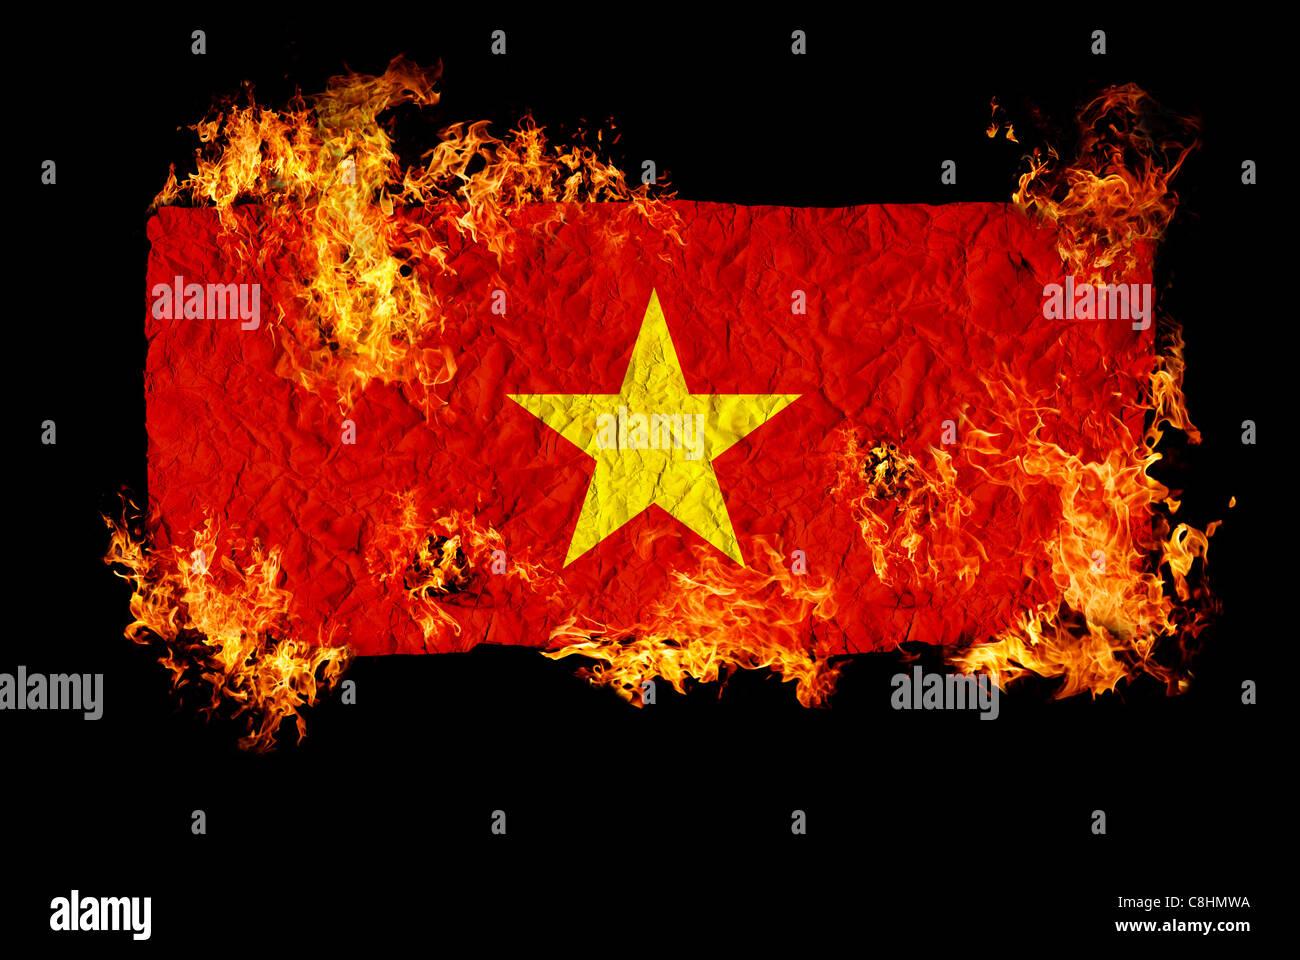 National Symbols And Flag Of Vietnam Stock Photo 39727558 Alamy